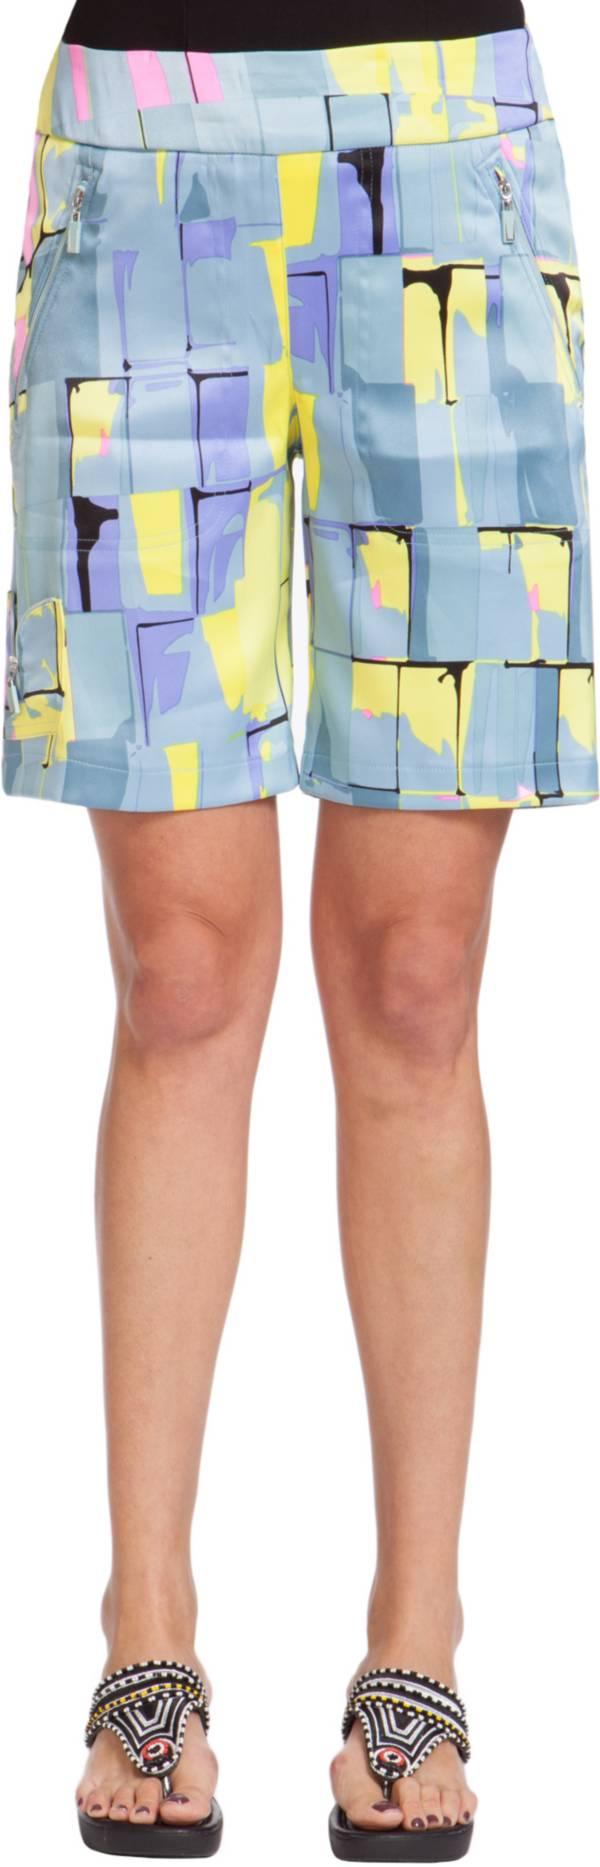 Jamie Sadock Women's Galleria Skinnyliscious Shorts product image